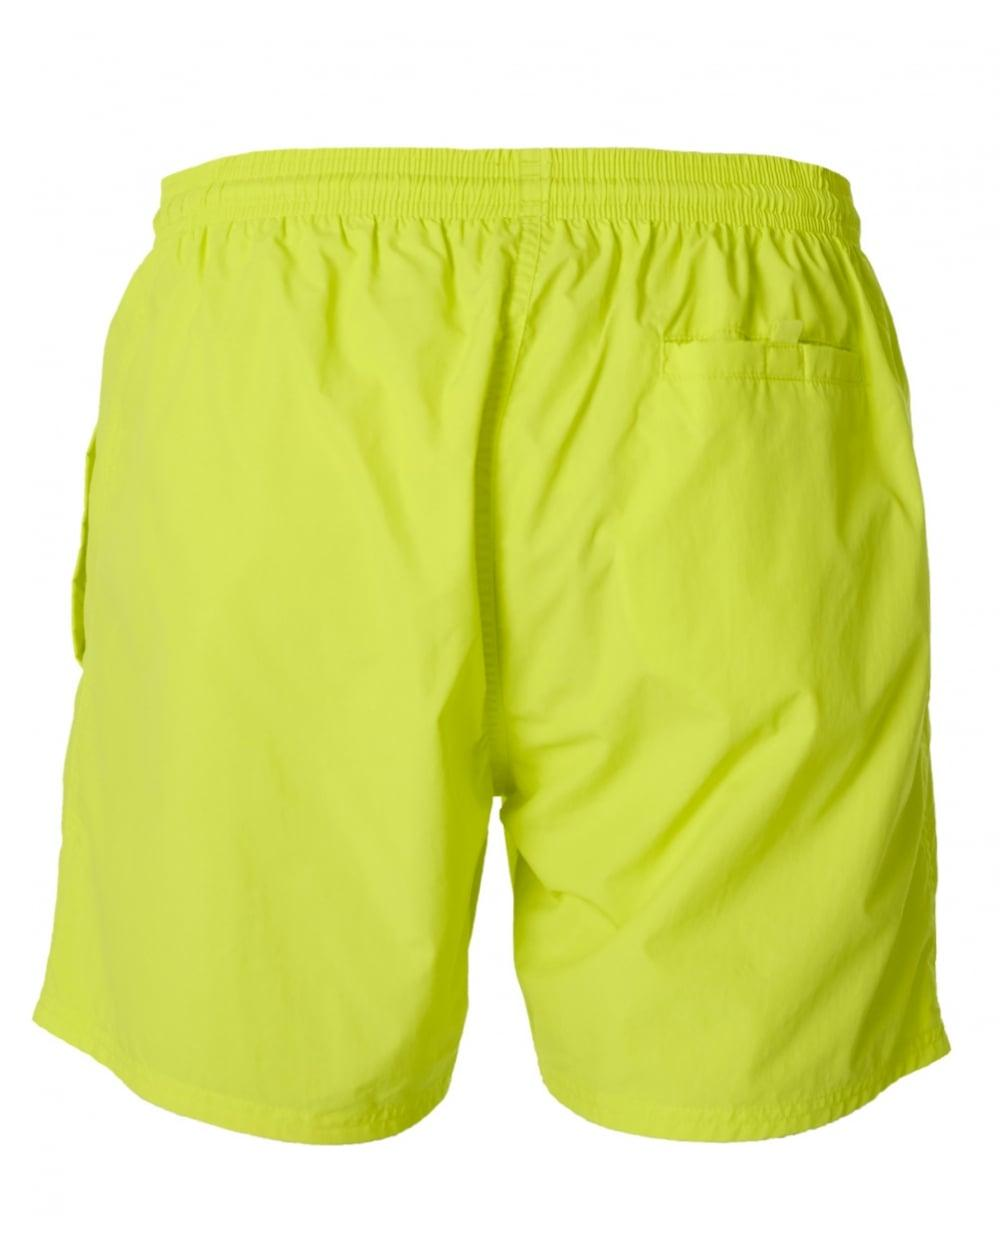 75f05bf4 BOSS by Hugo Boss Octopus Swim Shorts in Yellow for Men - Lyst